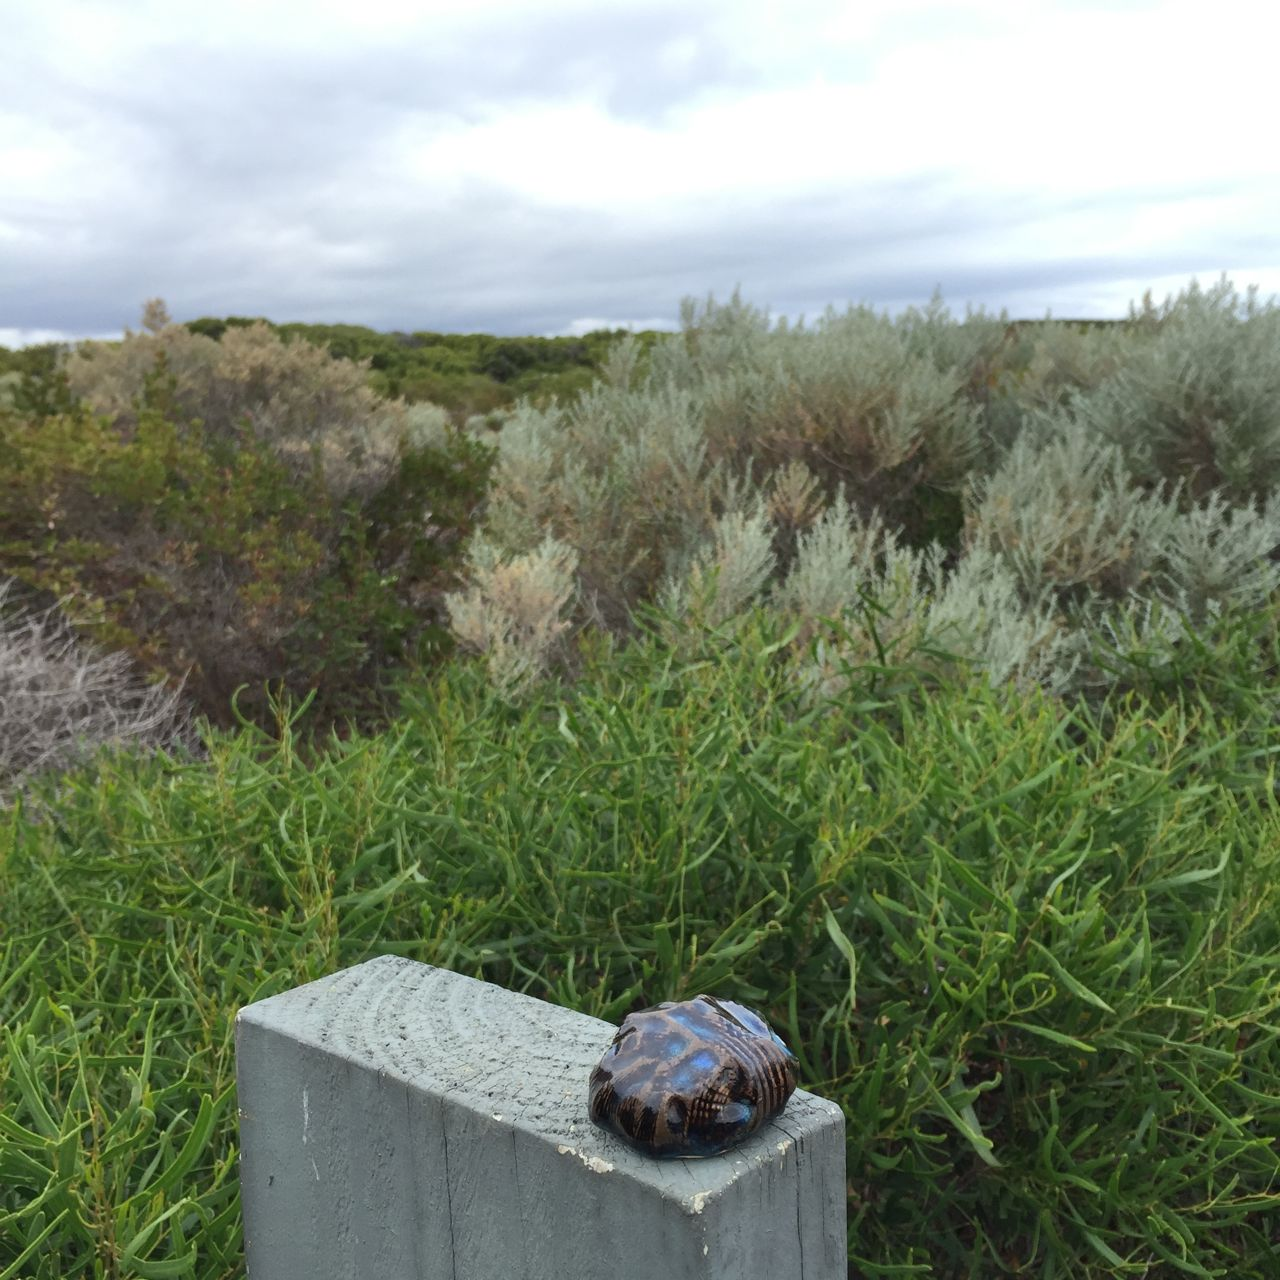 cape naturaliste . wa . australia 23.03.16